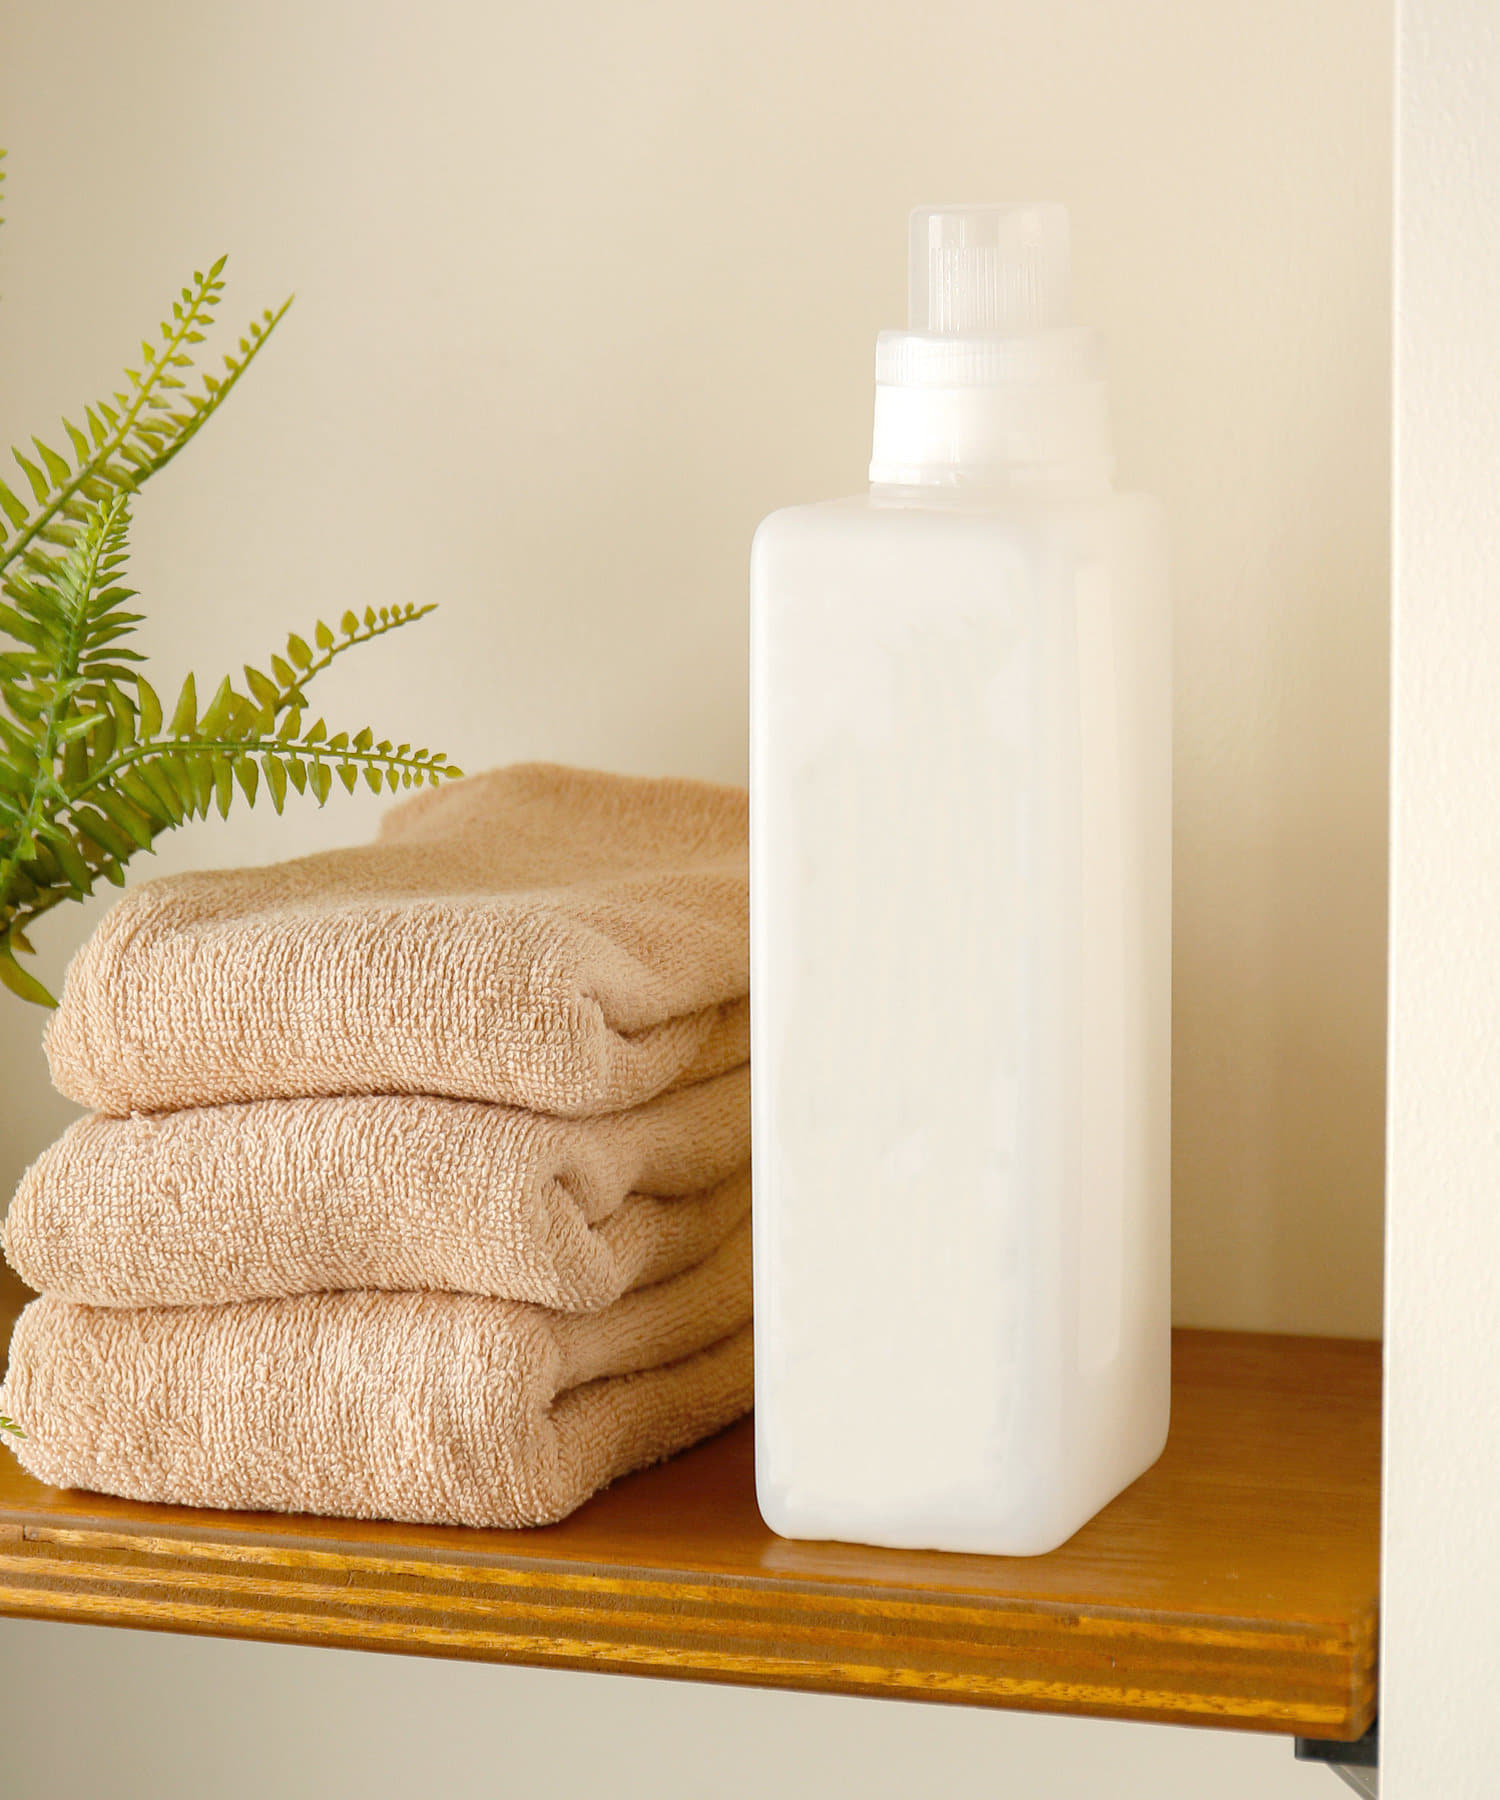 3COINS(スリーコインズ) ライフスタイル 洗剤ボトル:1000ml ホワイト